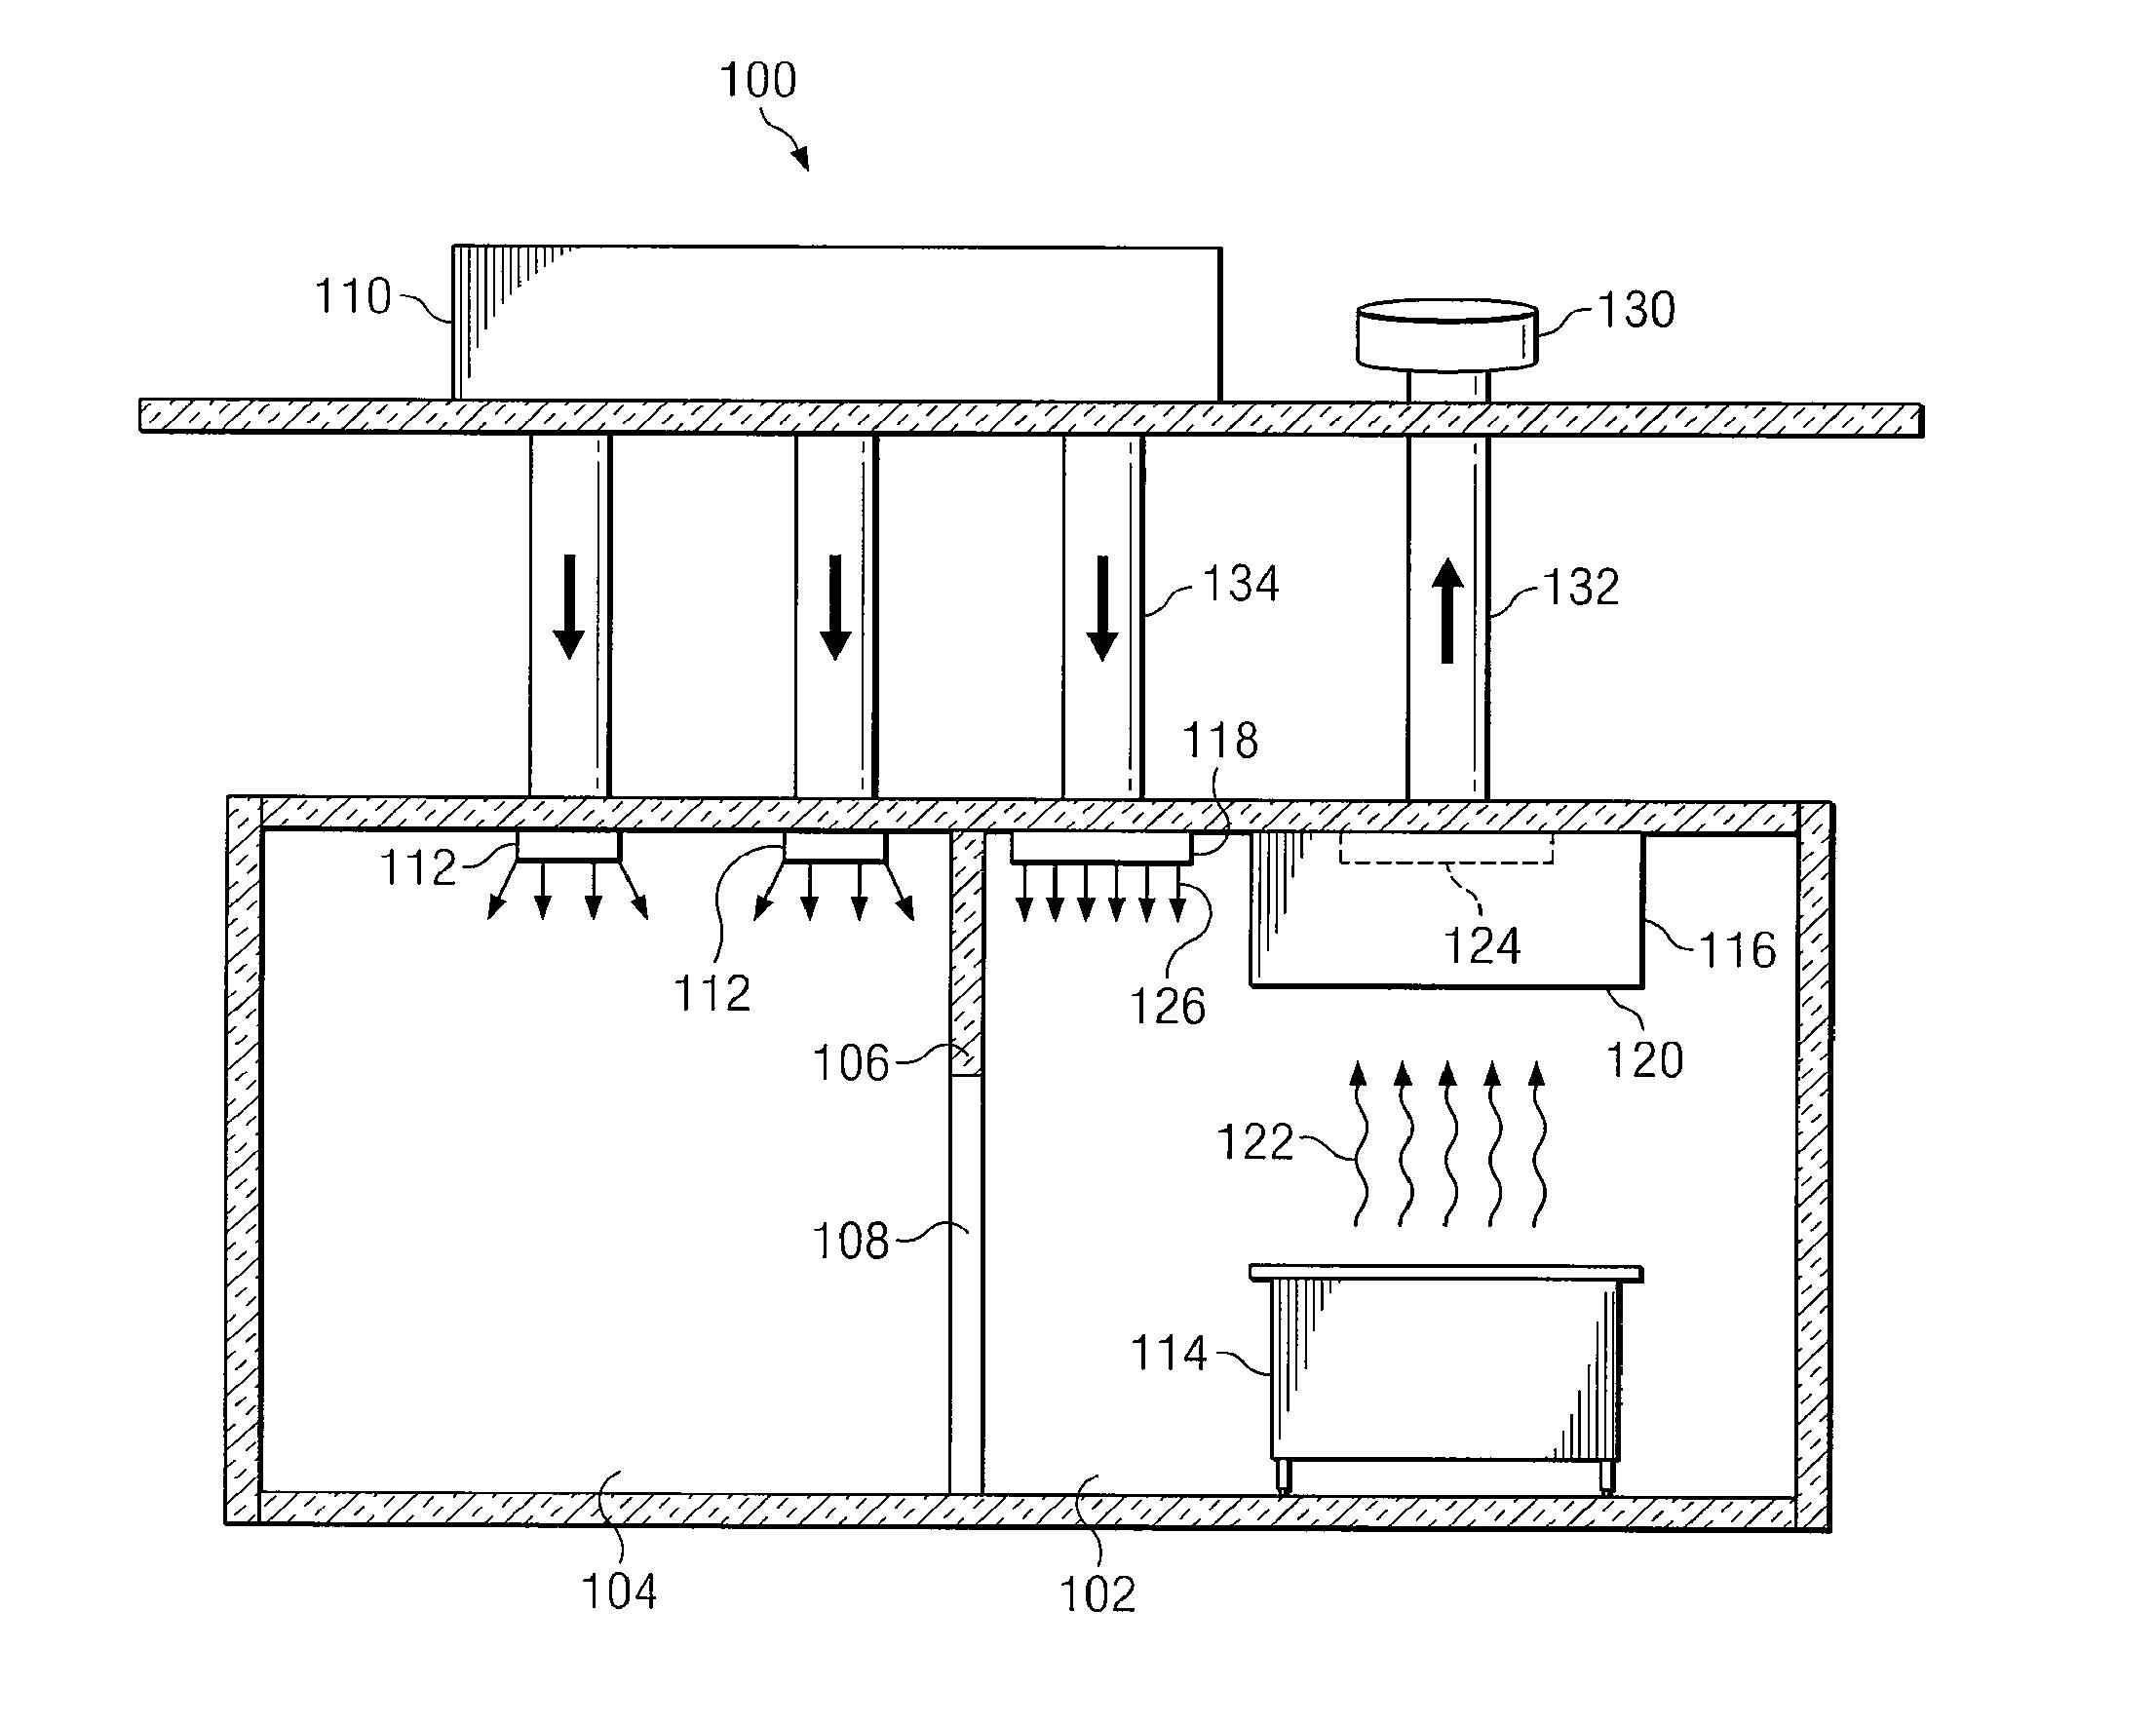 Wiring Diagram Ge Oven Schematic Diagram Solar Tracker Circuit Diagram